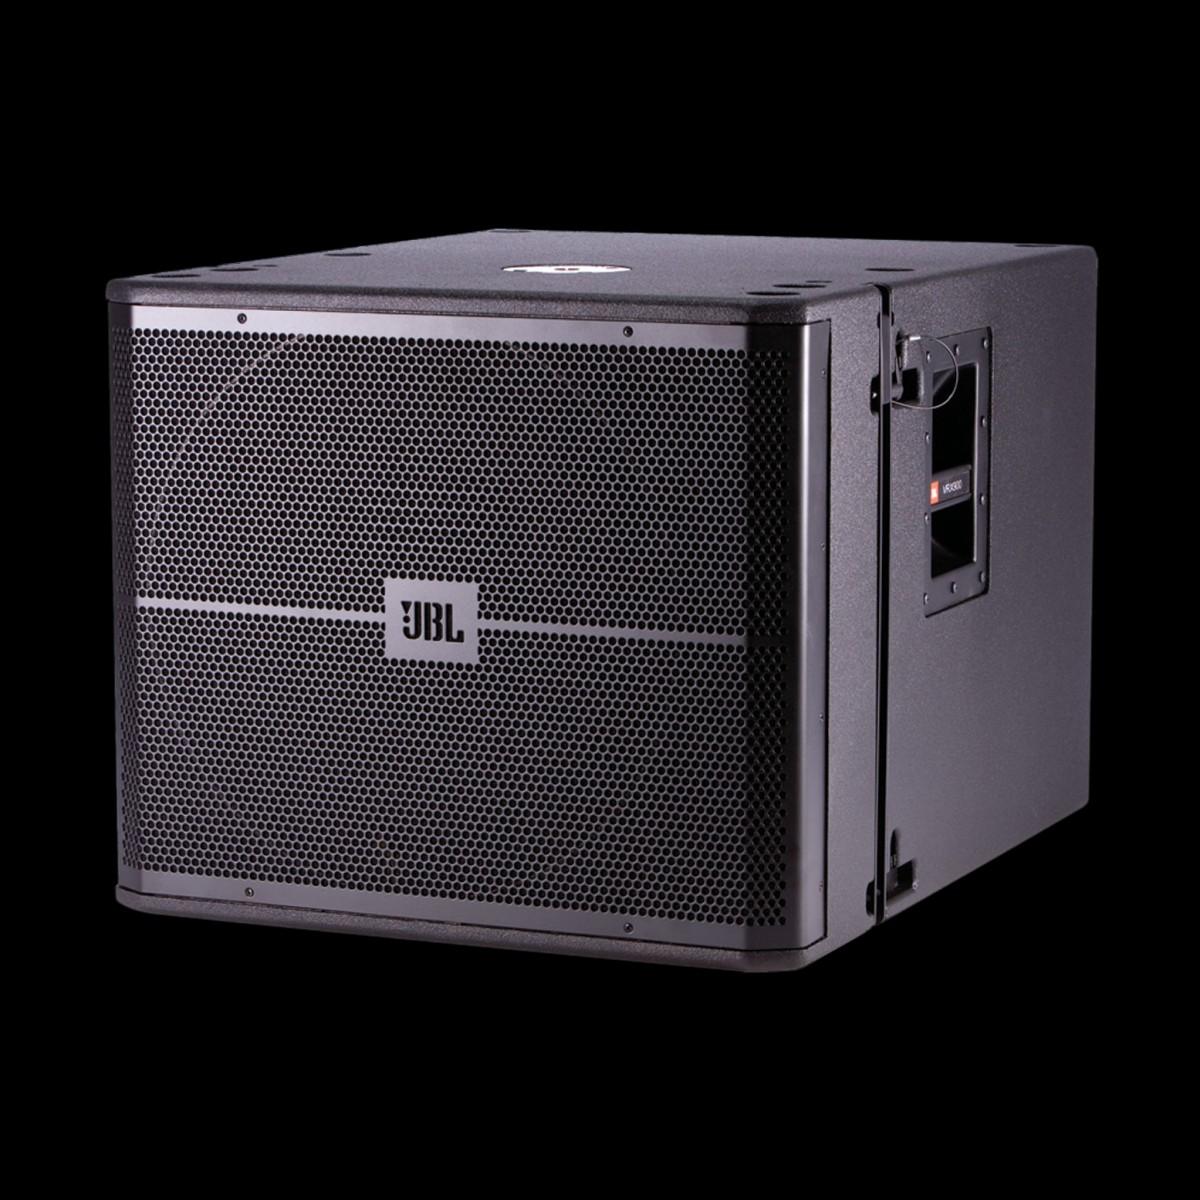 jbl vrx900 vrx918 s grille boven luidsprekerhoes baseline